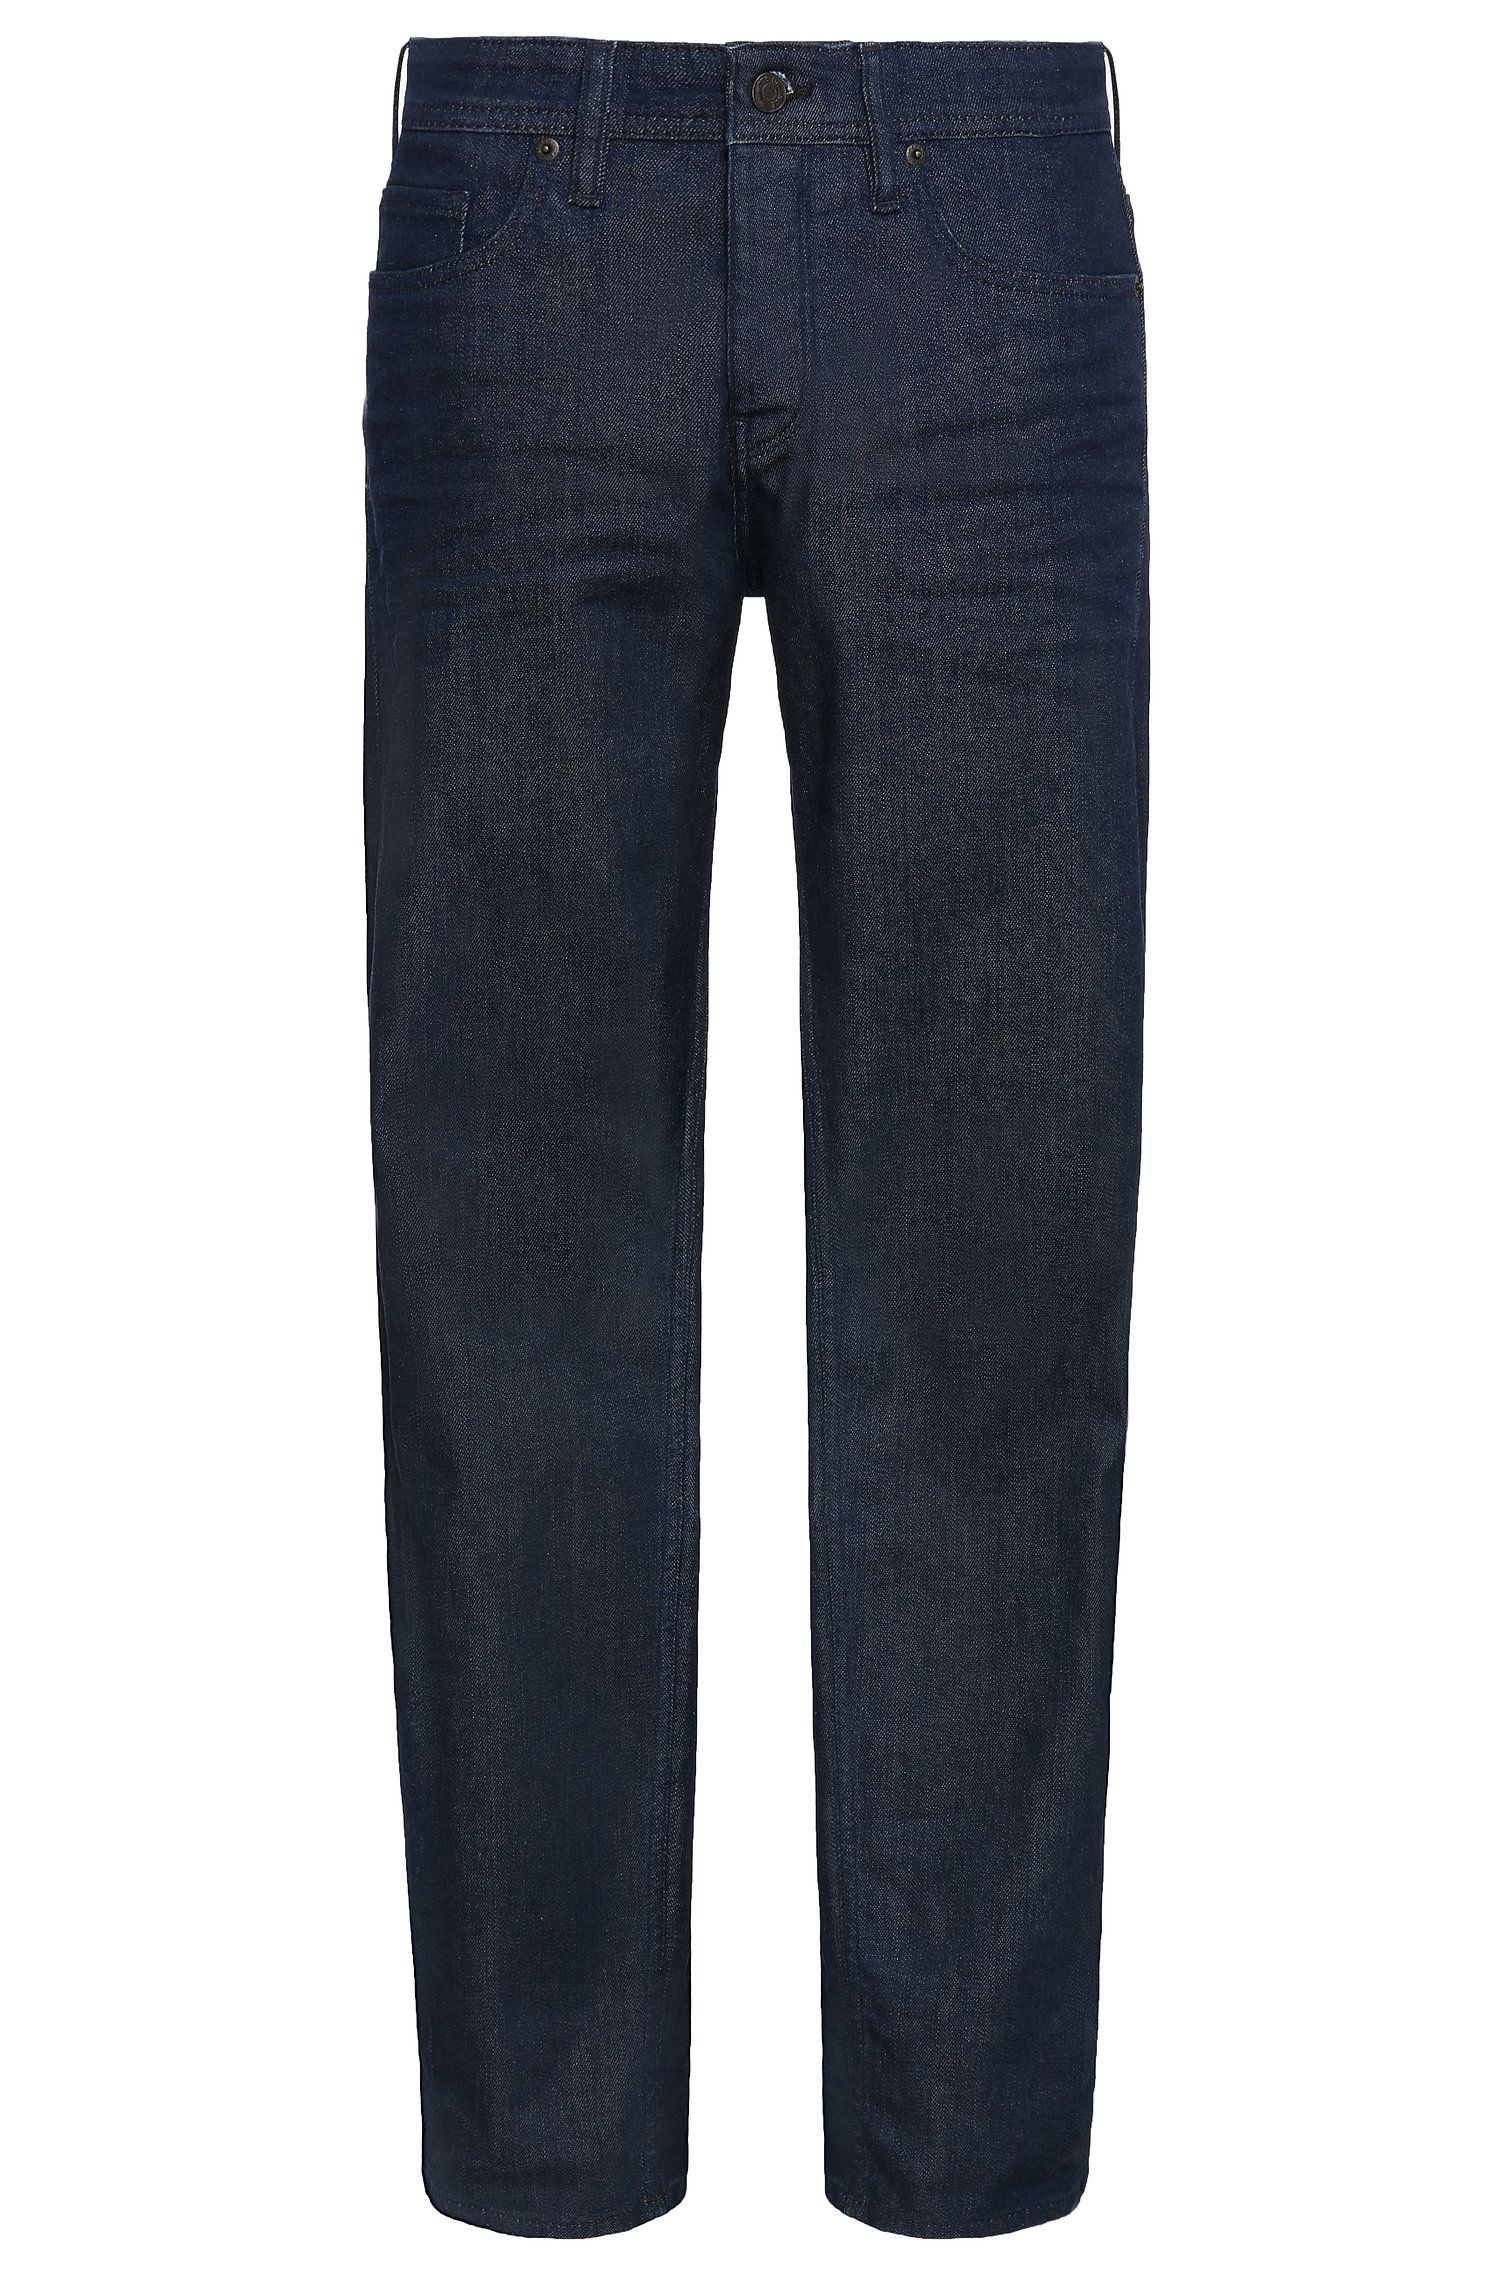 Jeans Tapered Fit en coton stretch: «Orange90»